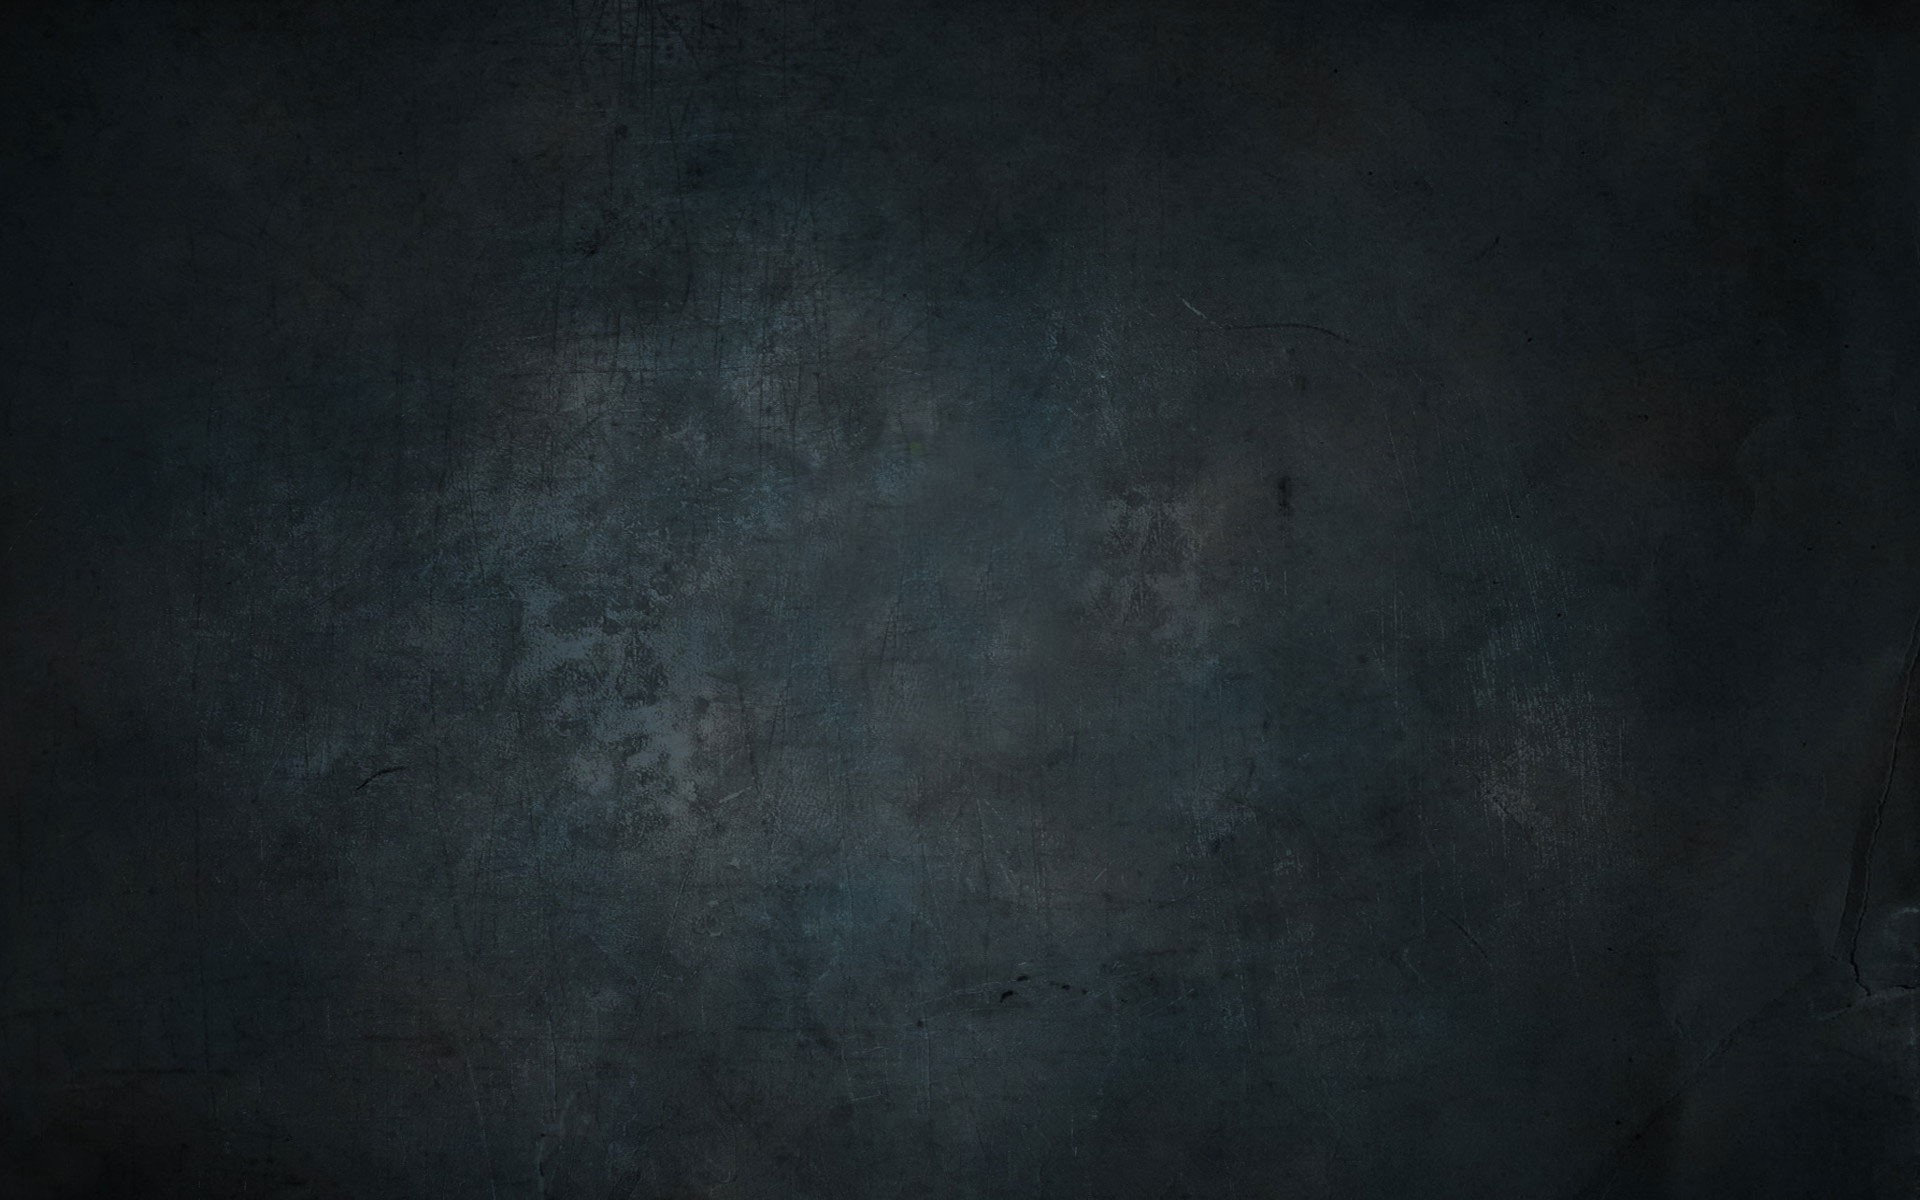 dark-grey-texture-abstract-hd-wallpaper-1920x1200-1223